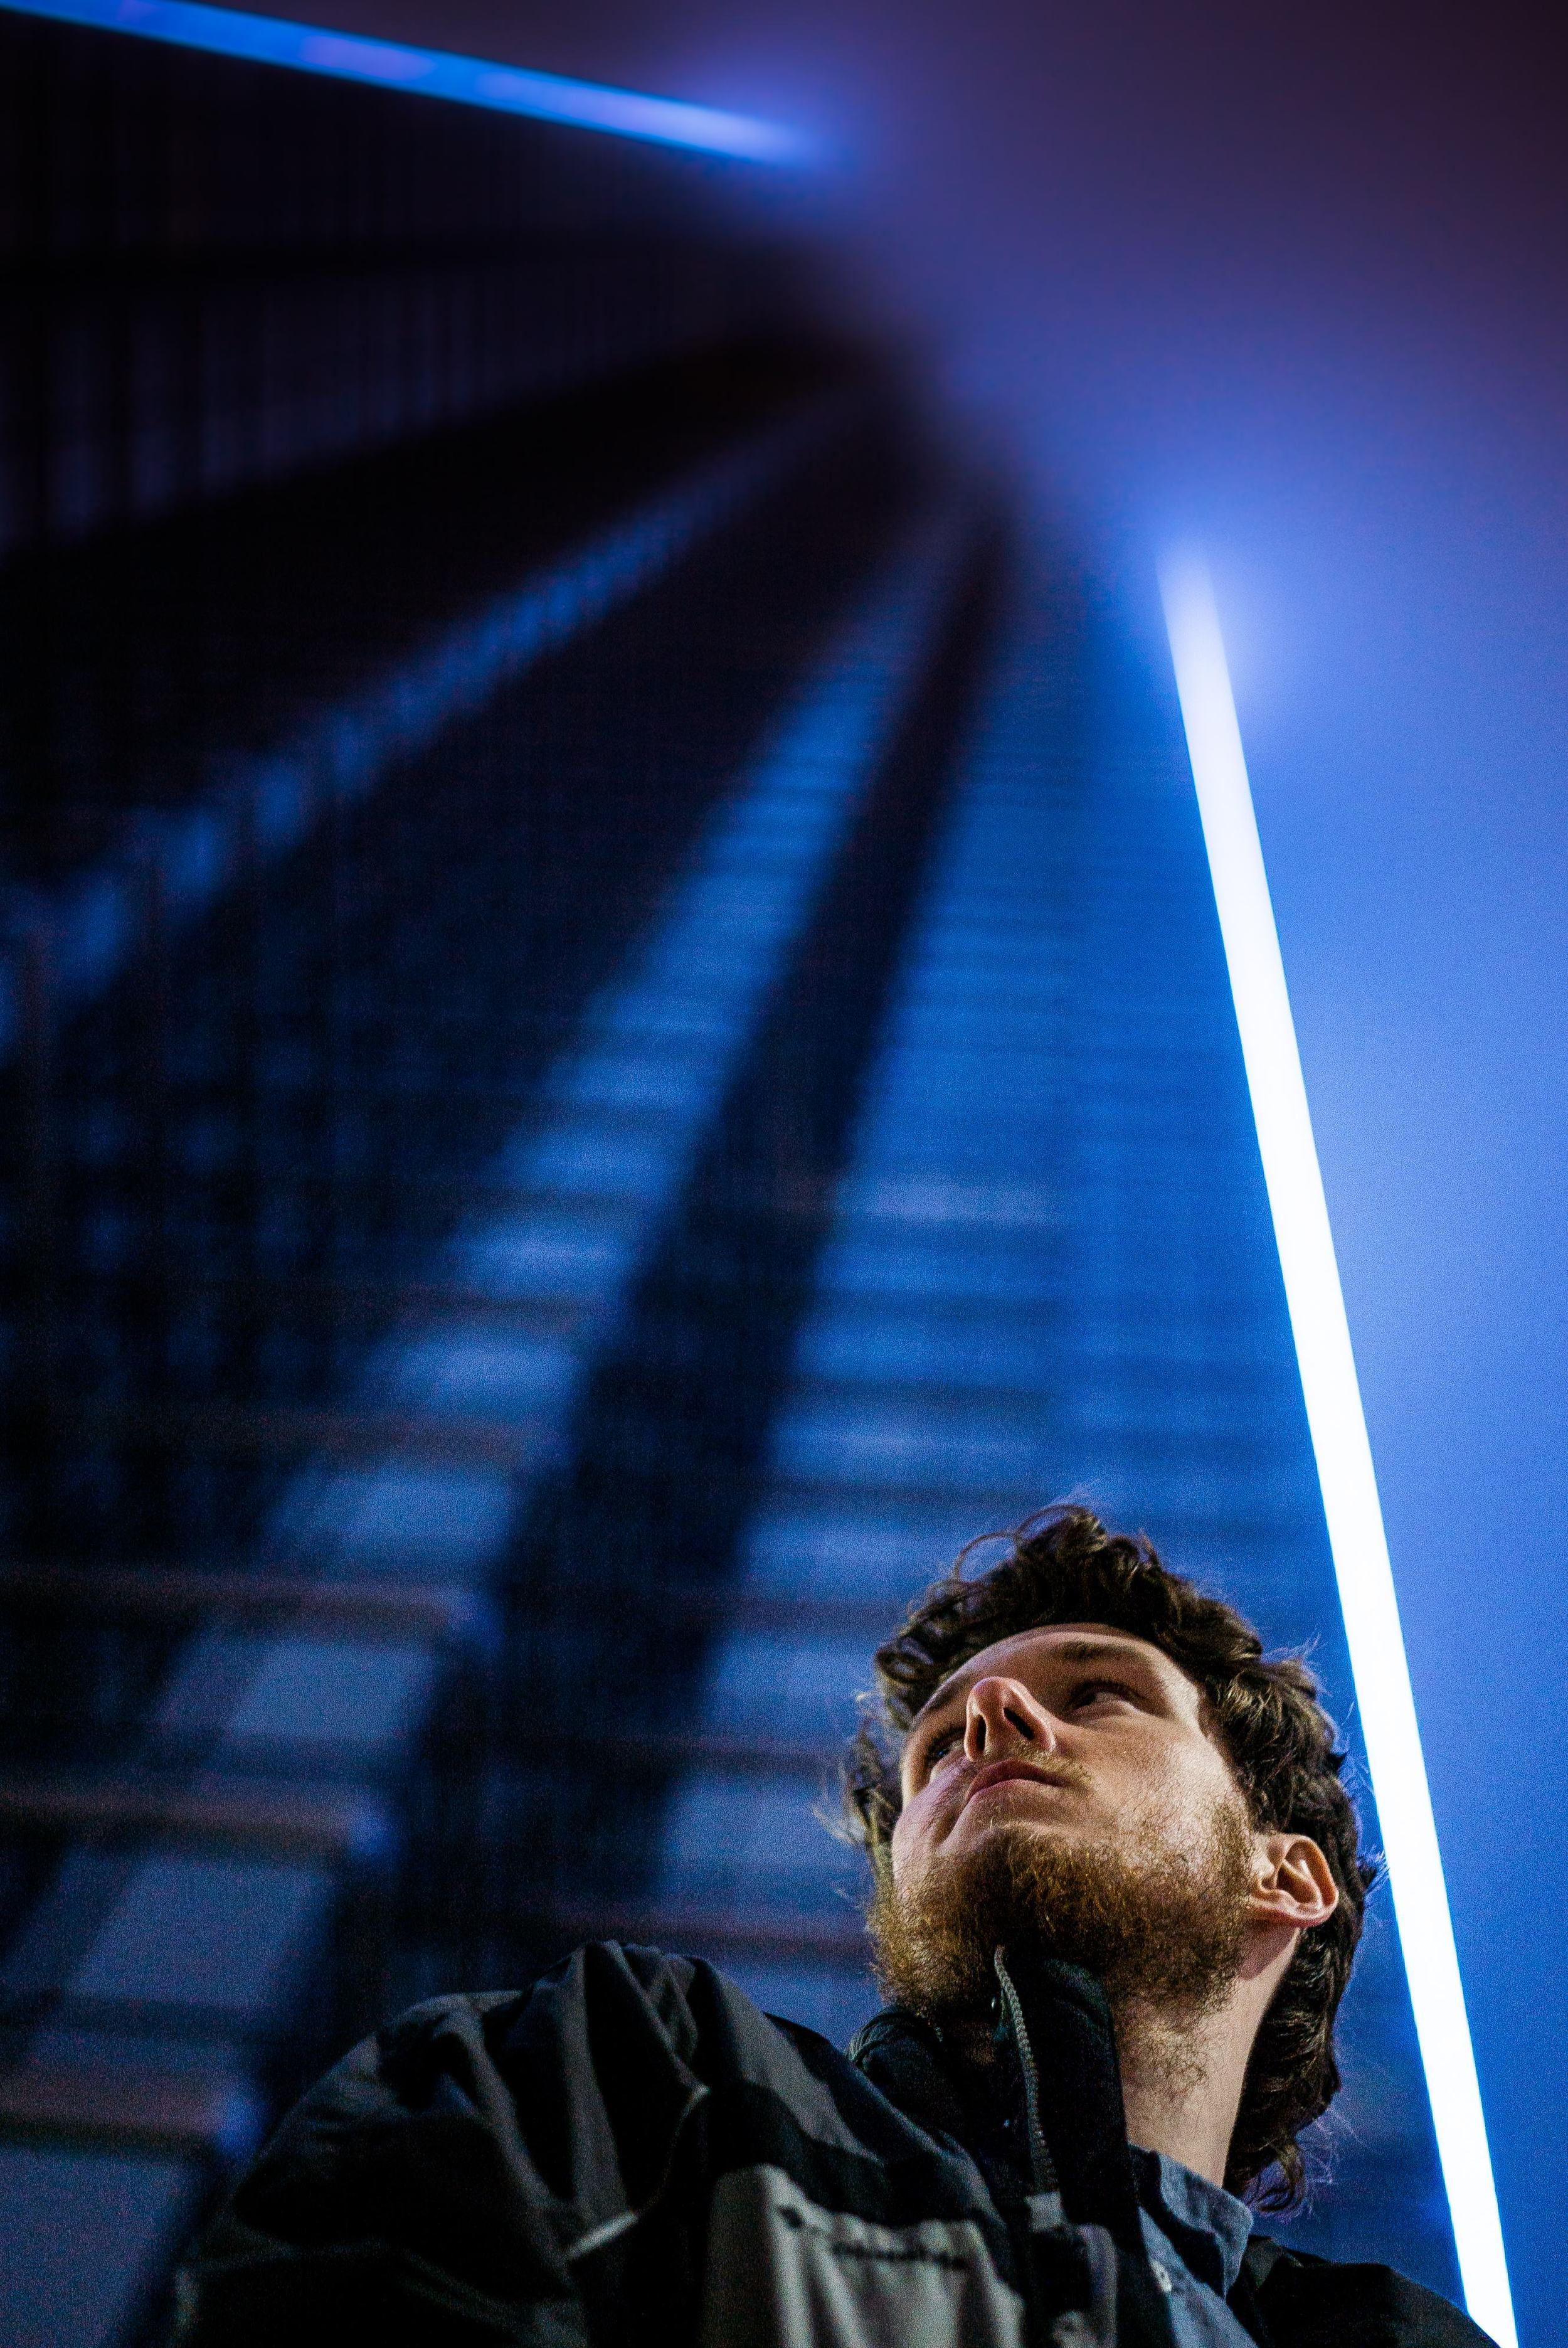 Sony A7s @F/2 - Bank Of America Building, Dallas